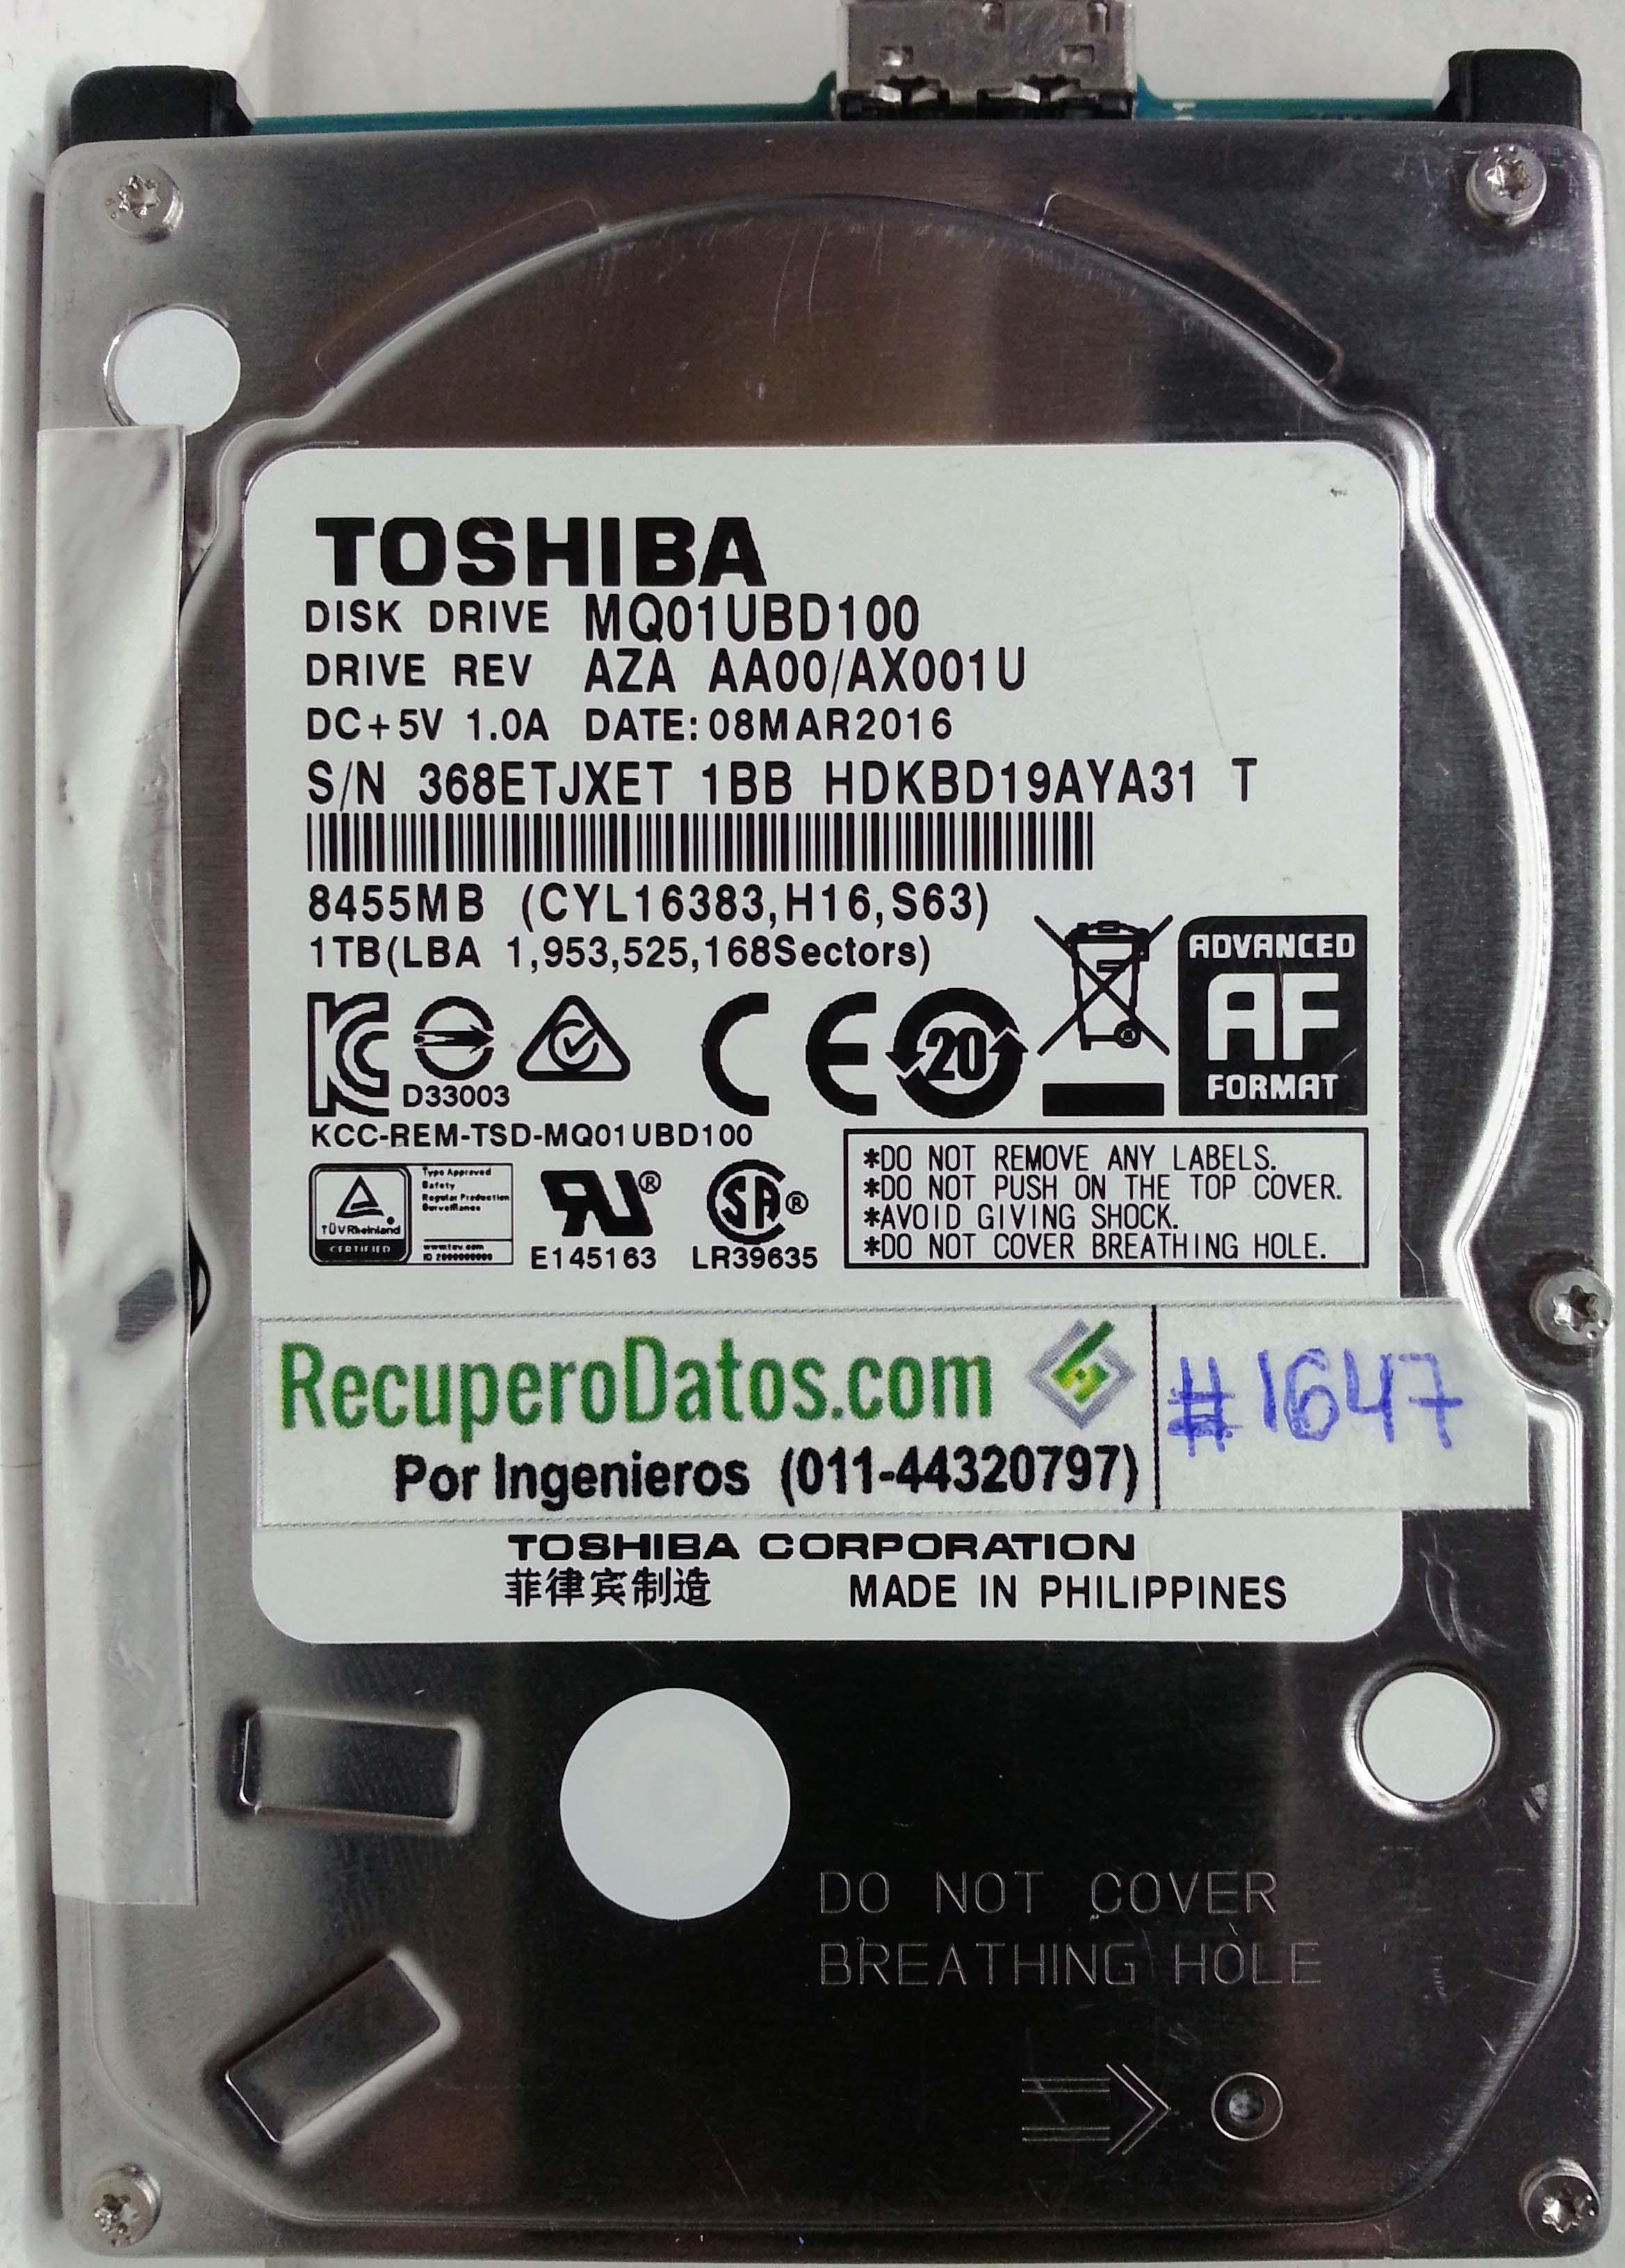 toshiba-MQ01UBD100